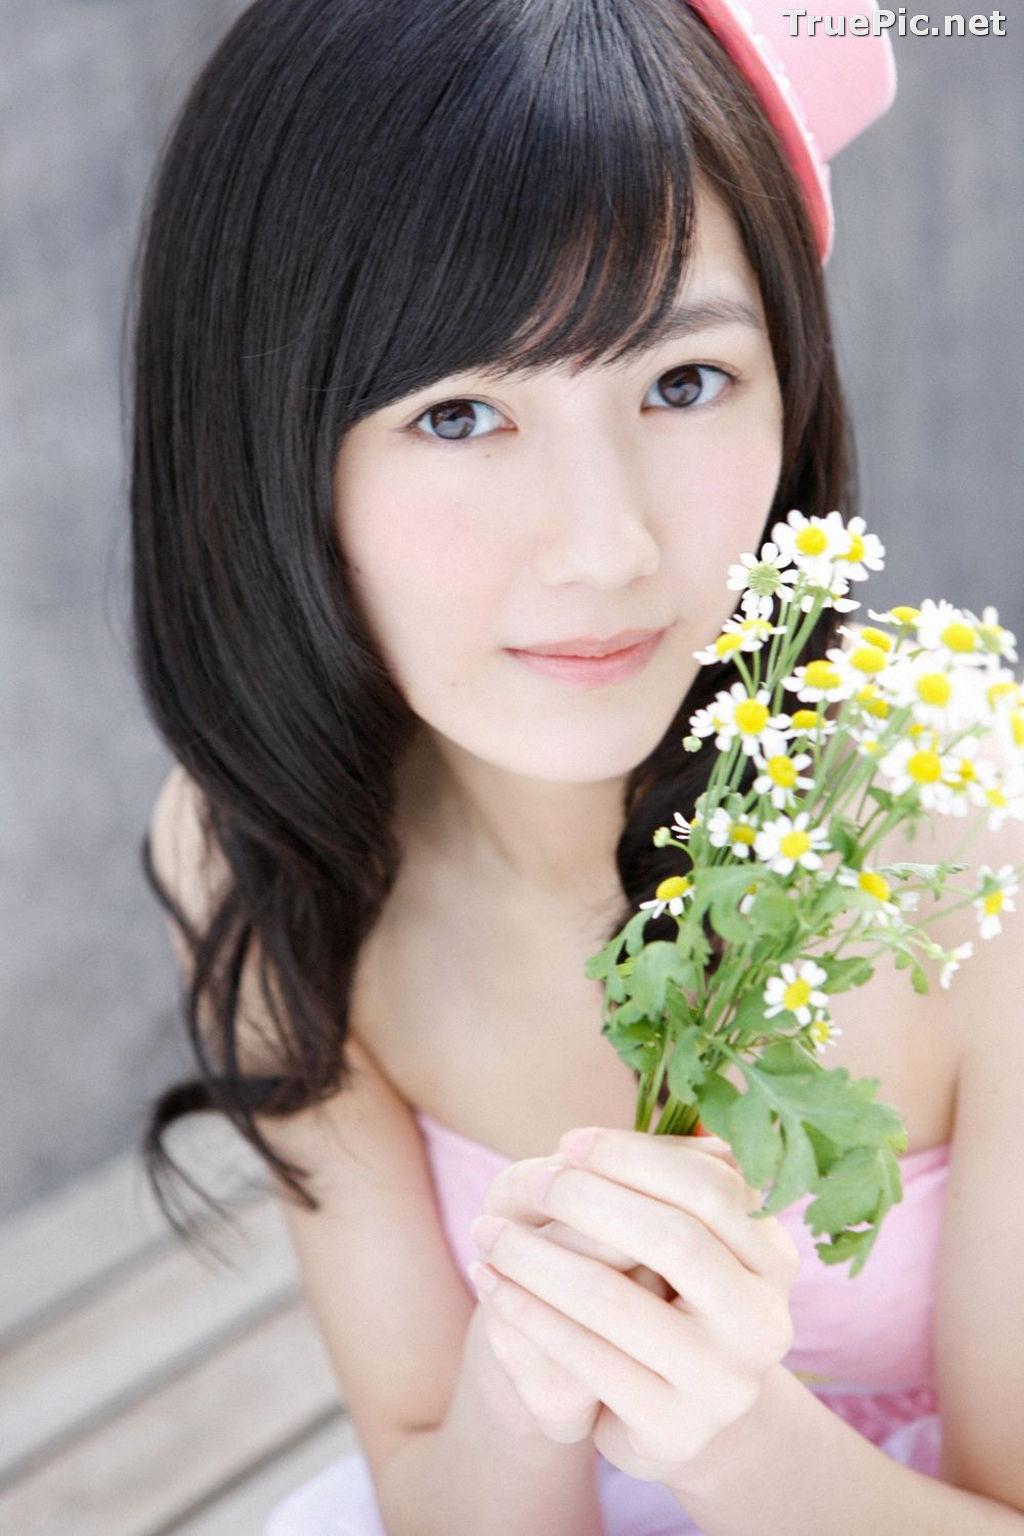 Image [YS Web] Vol.531 - Japanese Idol Girl Group (AKB48) - Mayu Watanabe - TruePic.net - Picture-7